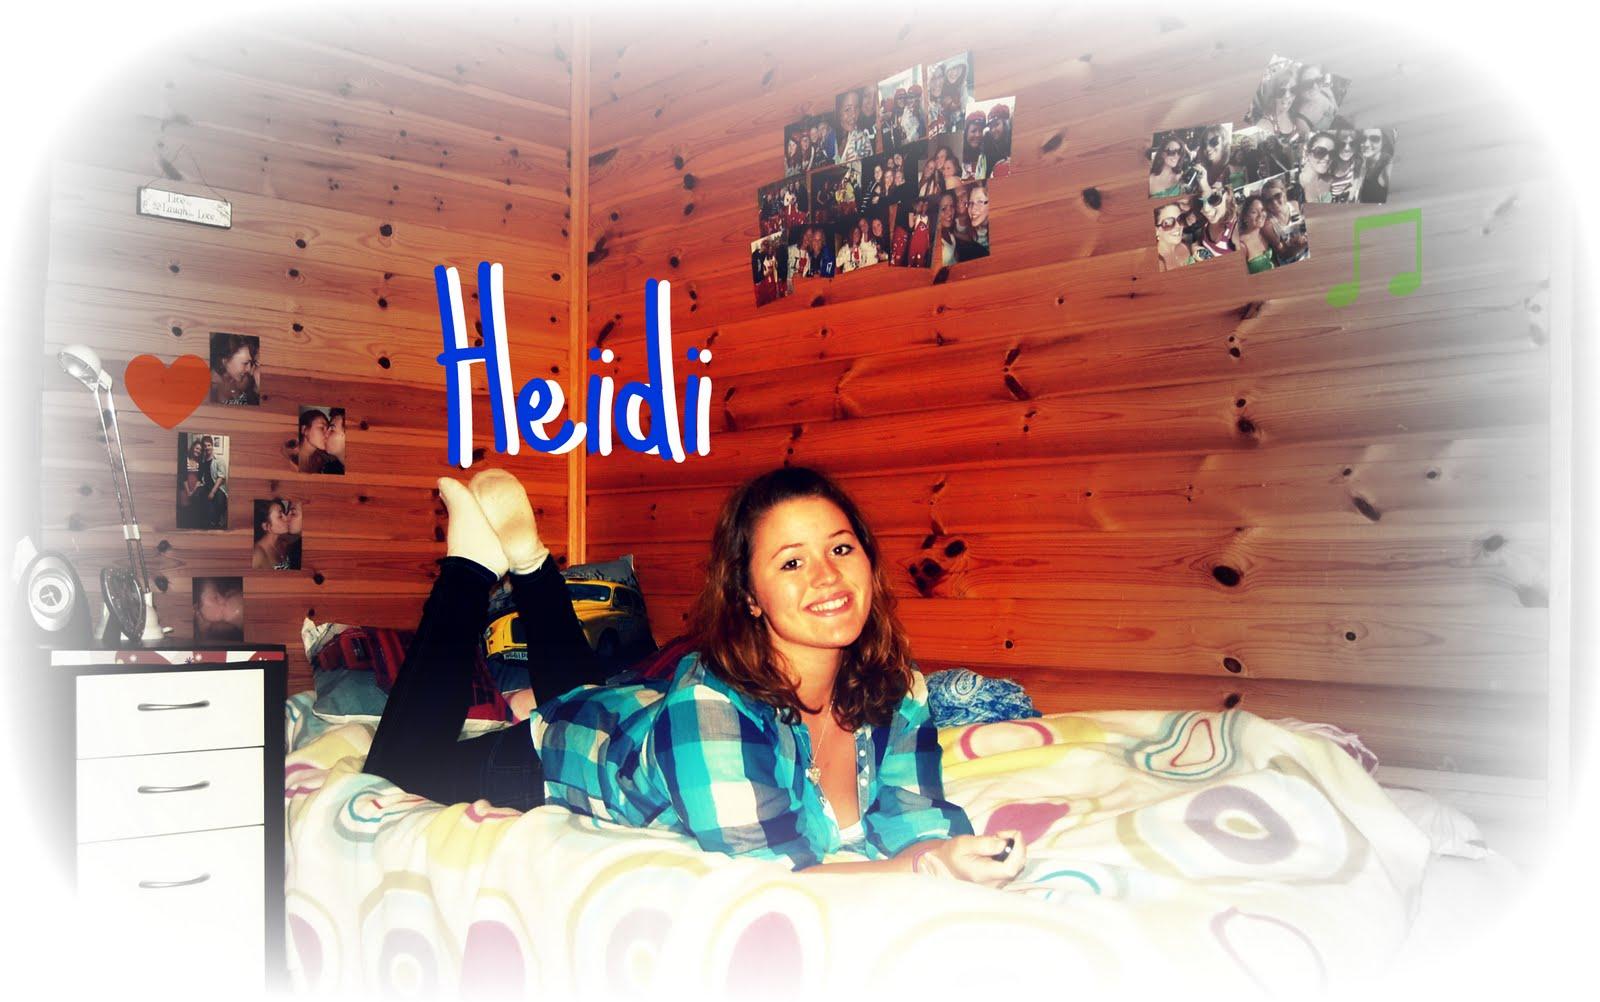 Heidi i BØ